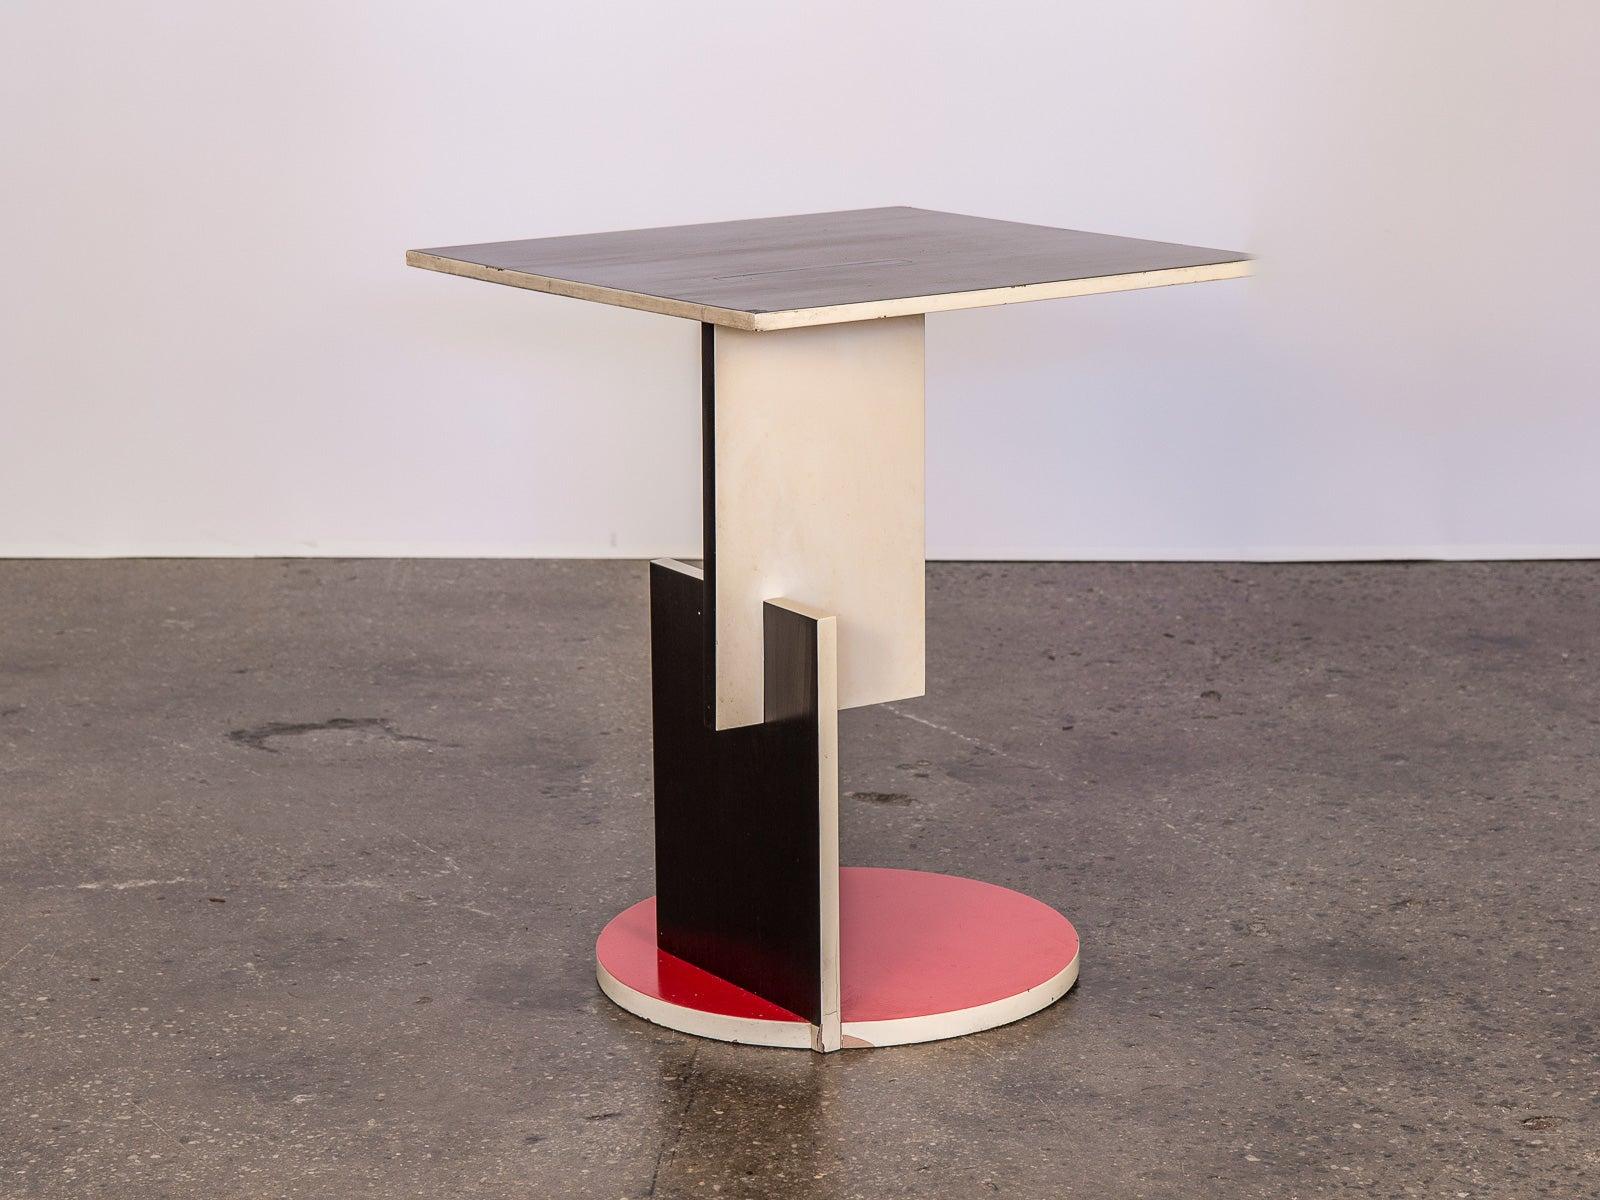 Stijl Table For Cassina Schroeder De 3TKcFl1J